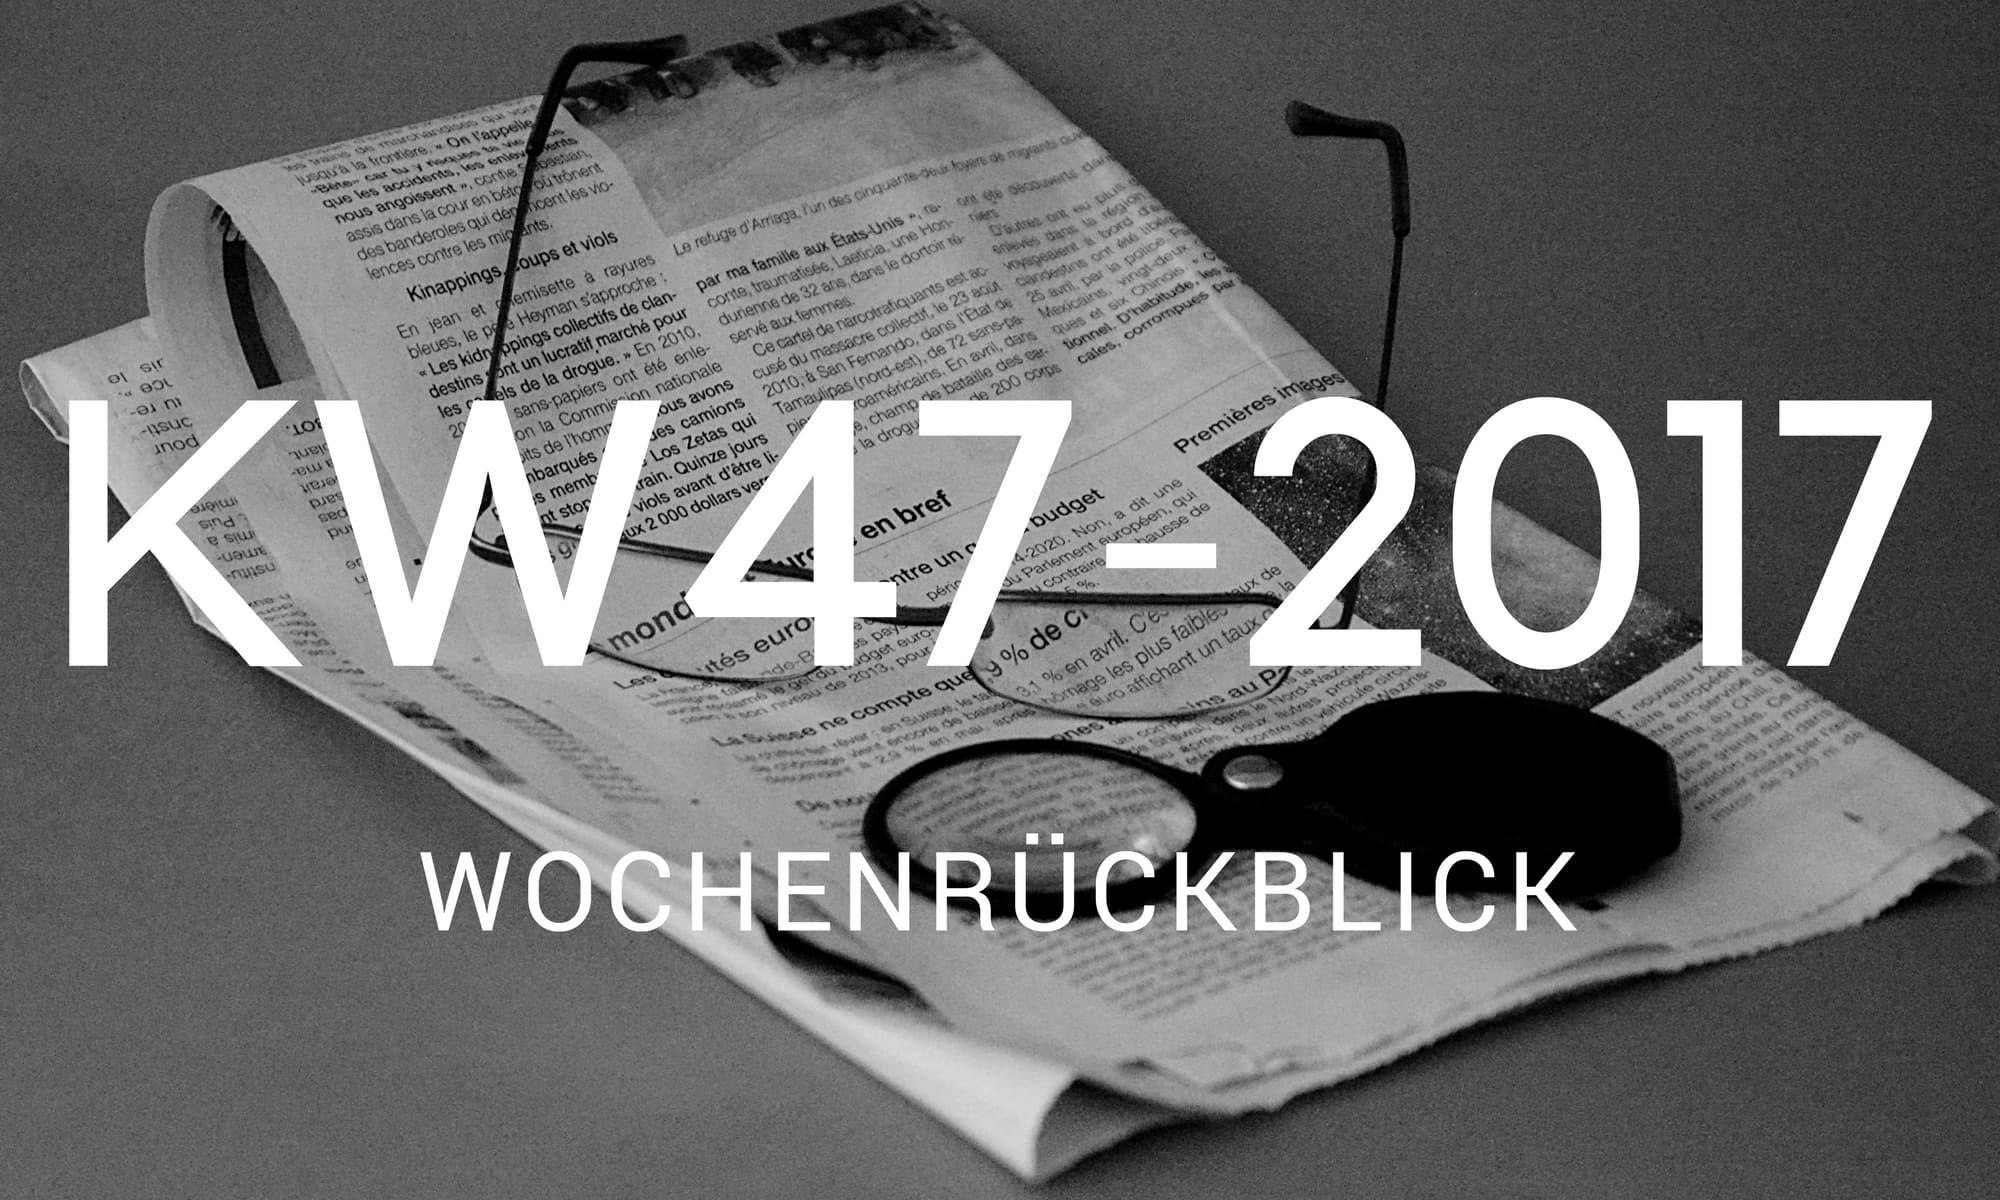 wochenrueckblick camping news KW47/2017